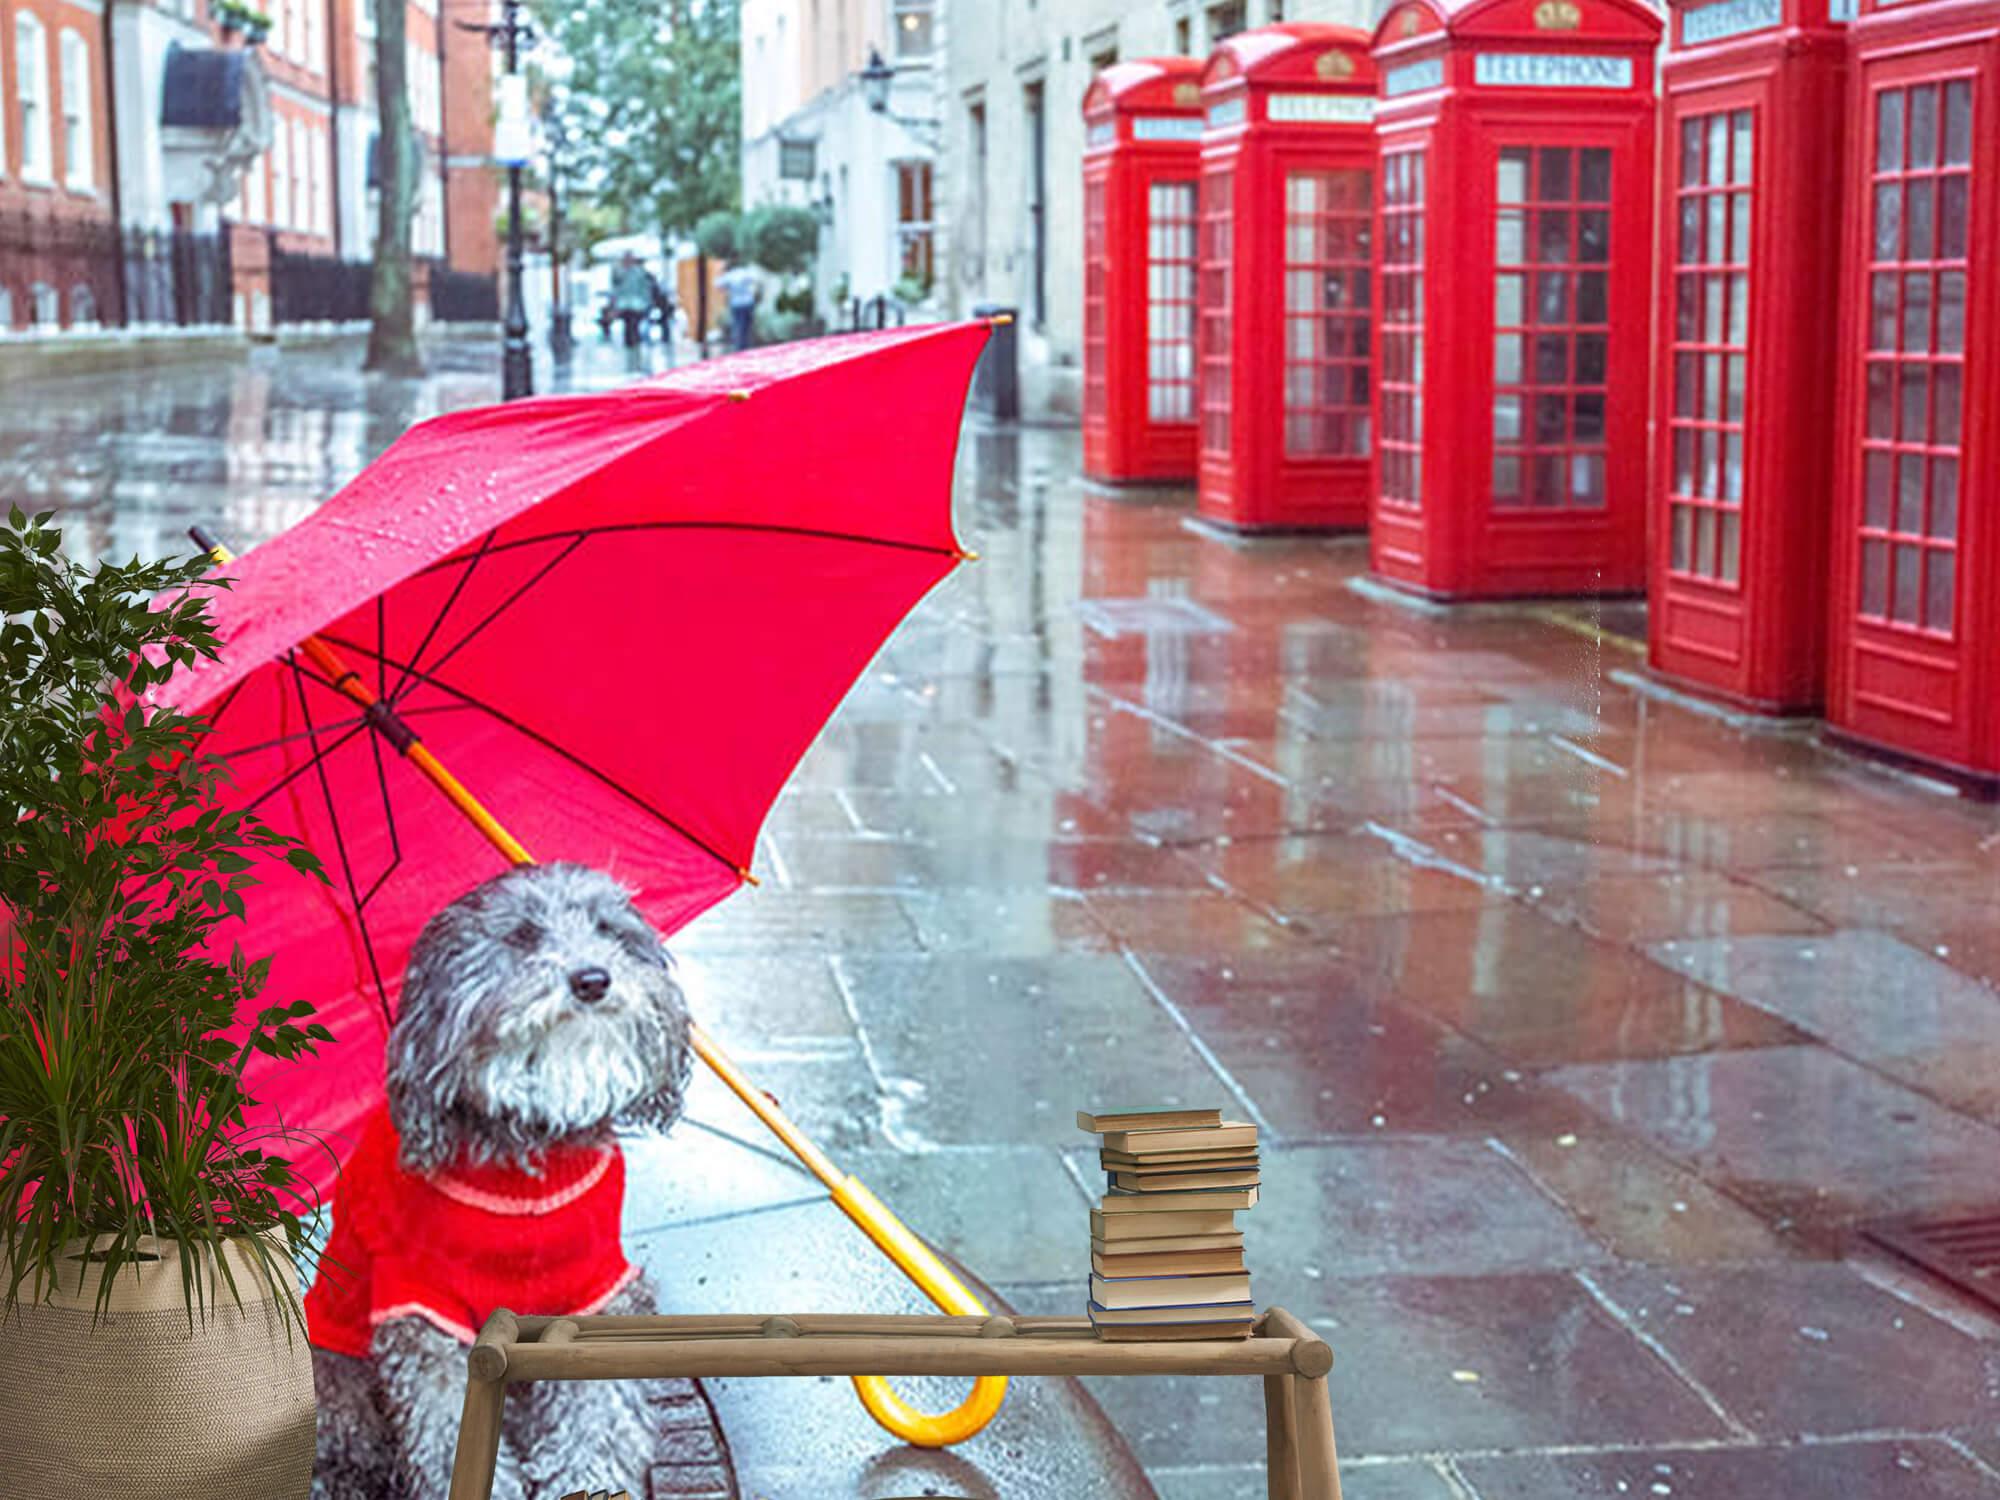 Dog with umbrella 14